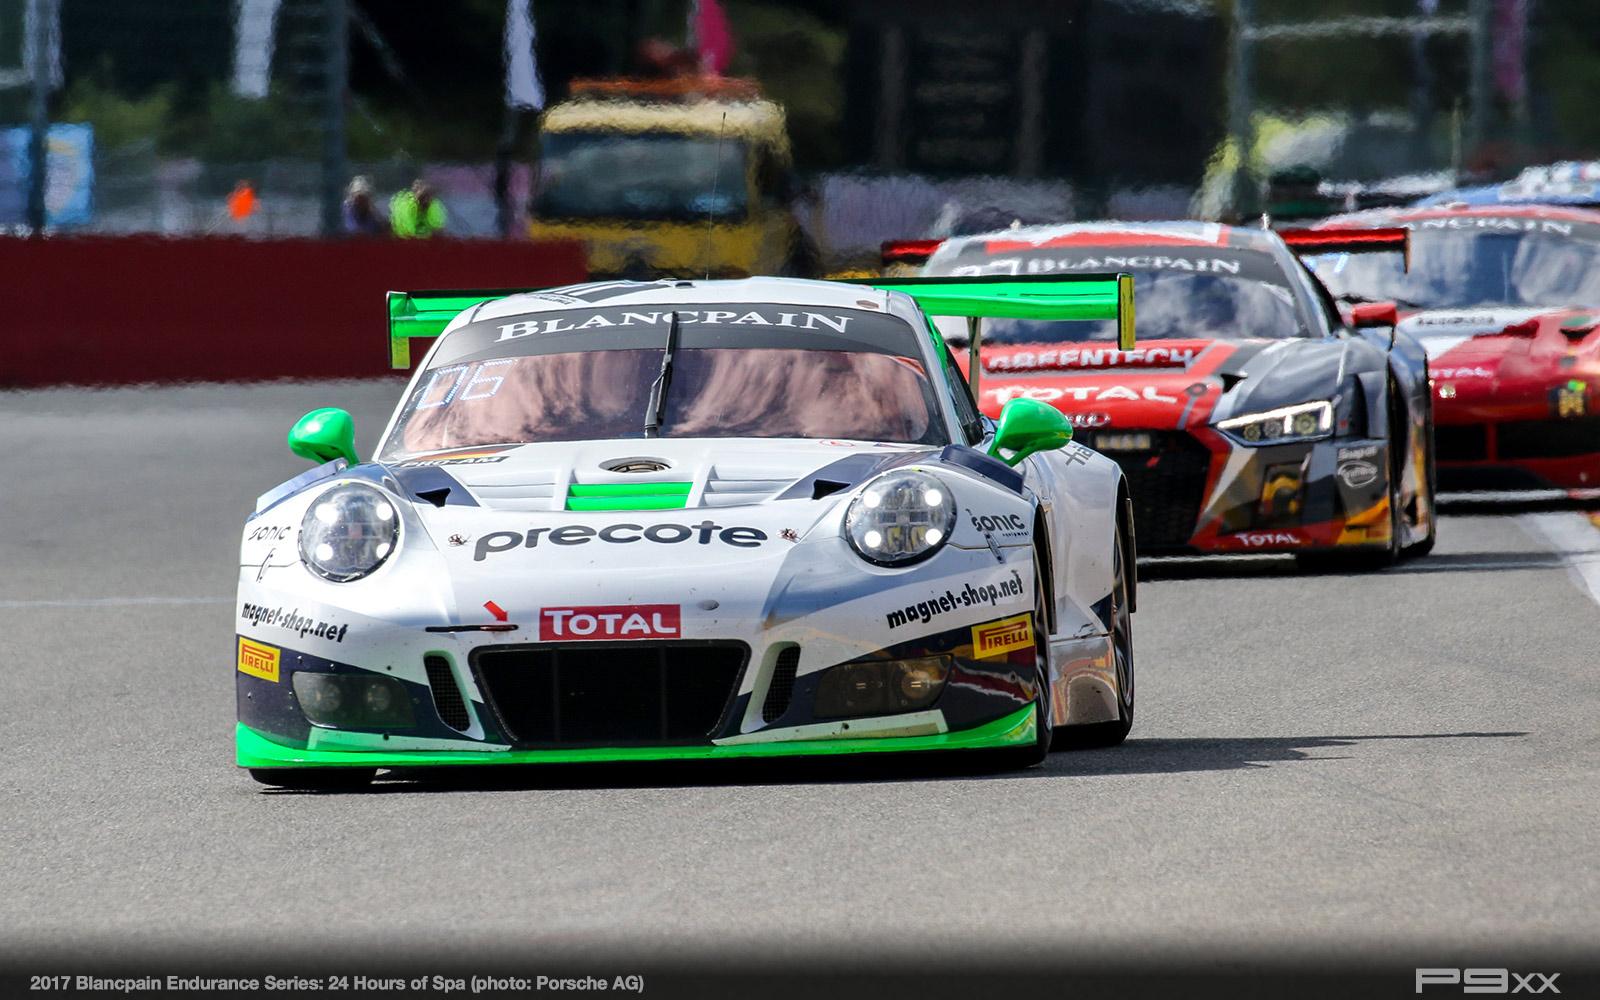 2017-24-Hours-of-Spa-Porsche-347